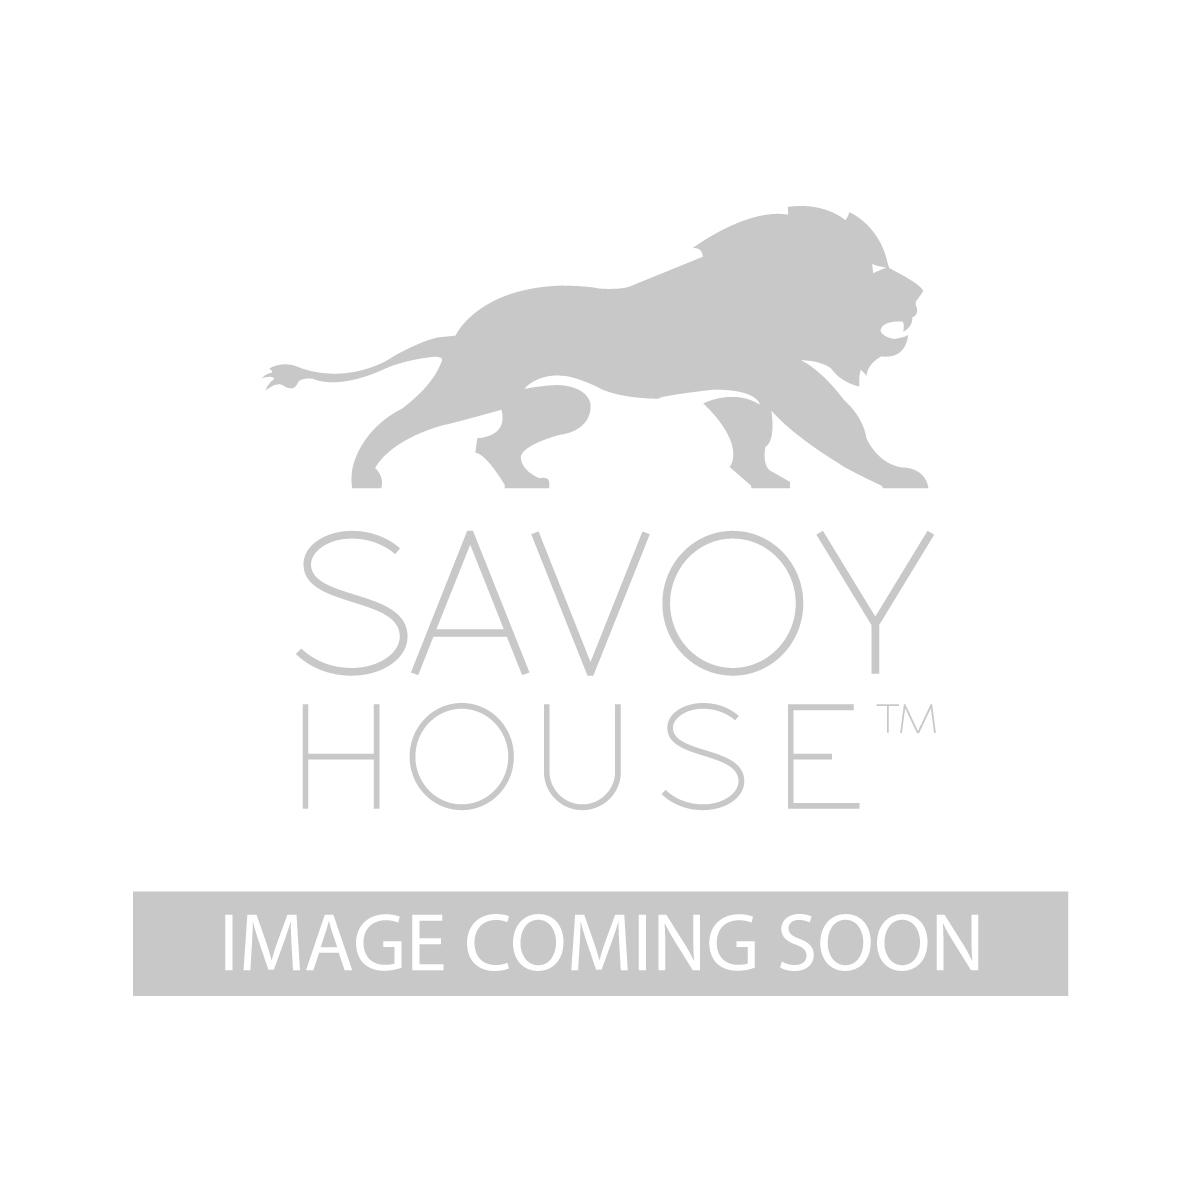 8 430 4 128 chelsey 4 light bath bar by savoy house chelsey 4 light bath bar aloadofball Images